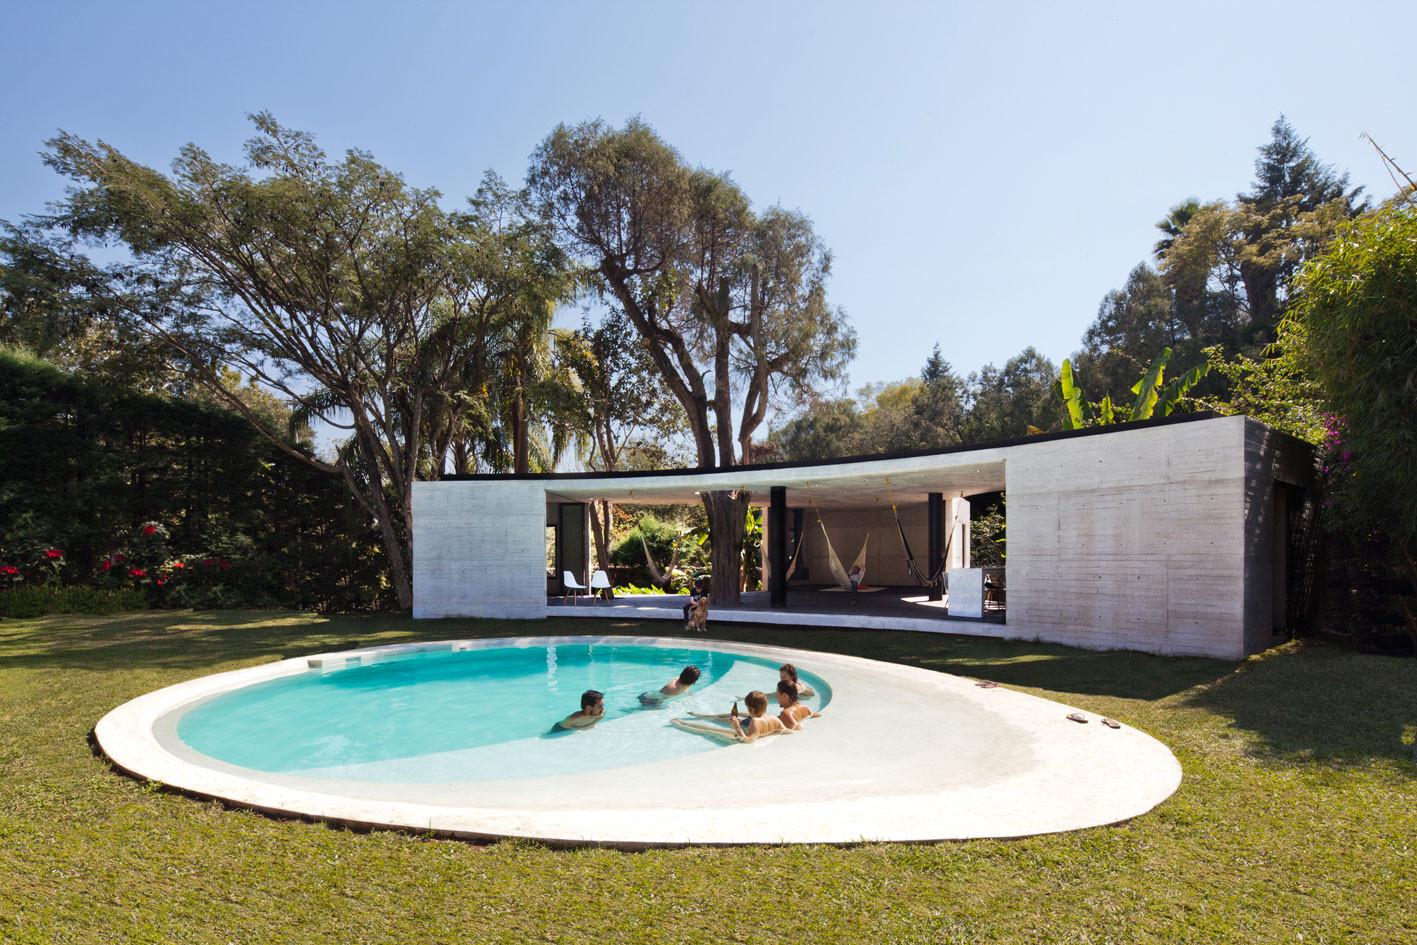 Tepoztlan Lounge / Cadaval & Solà-Morales, © Sandra Pereznieto